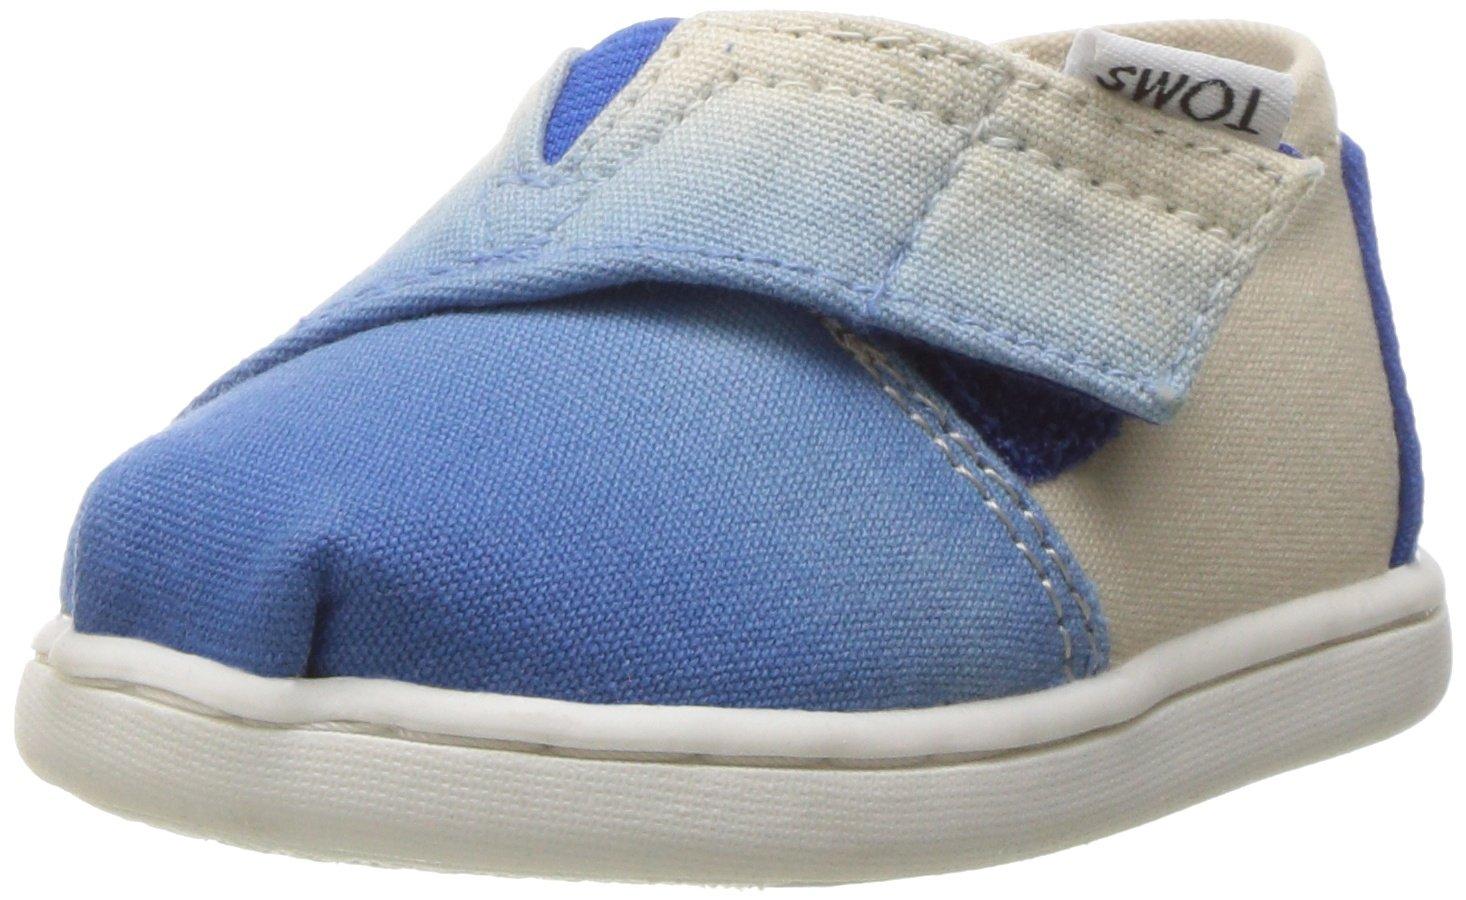 TOMS Girls' 10009922 Alpargata-K, Blue, 11 M US Toddler